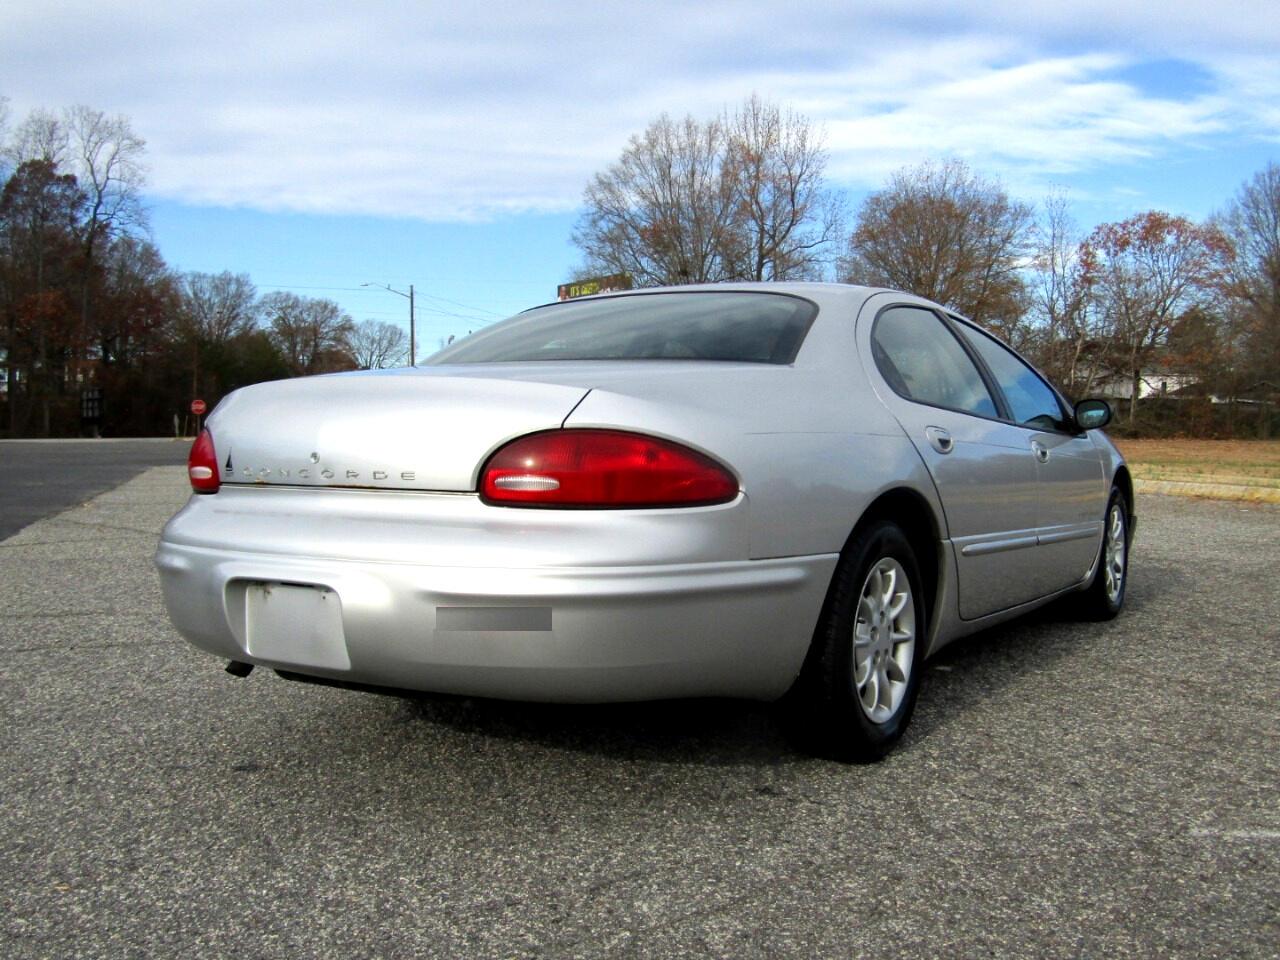 2000 Chrysler Concorde LX